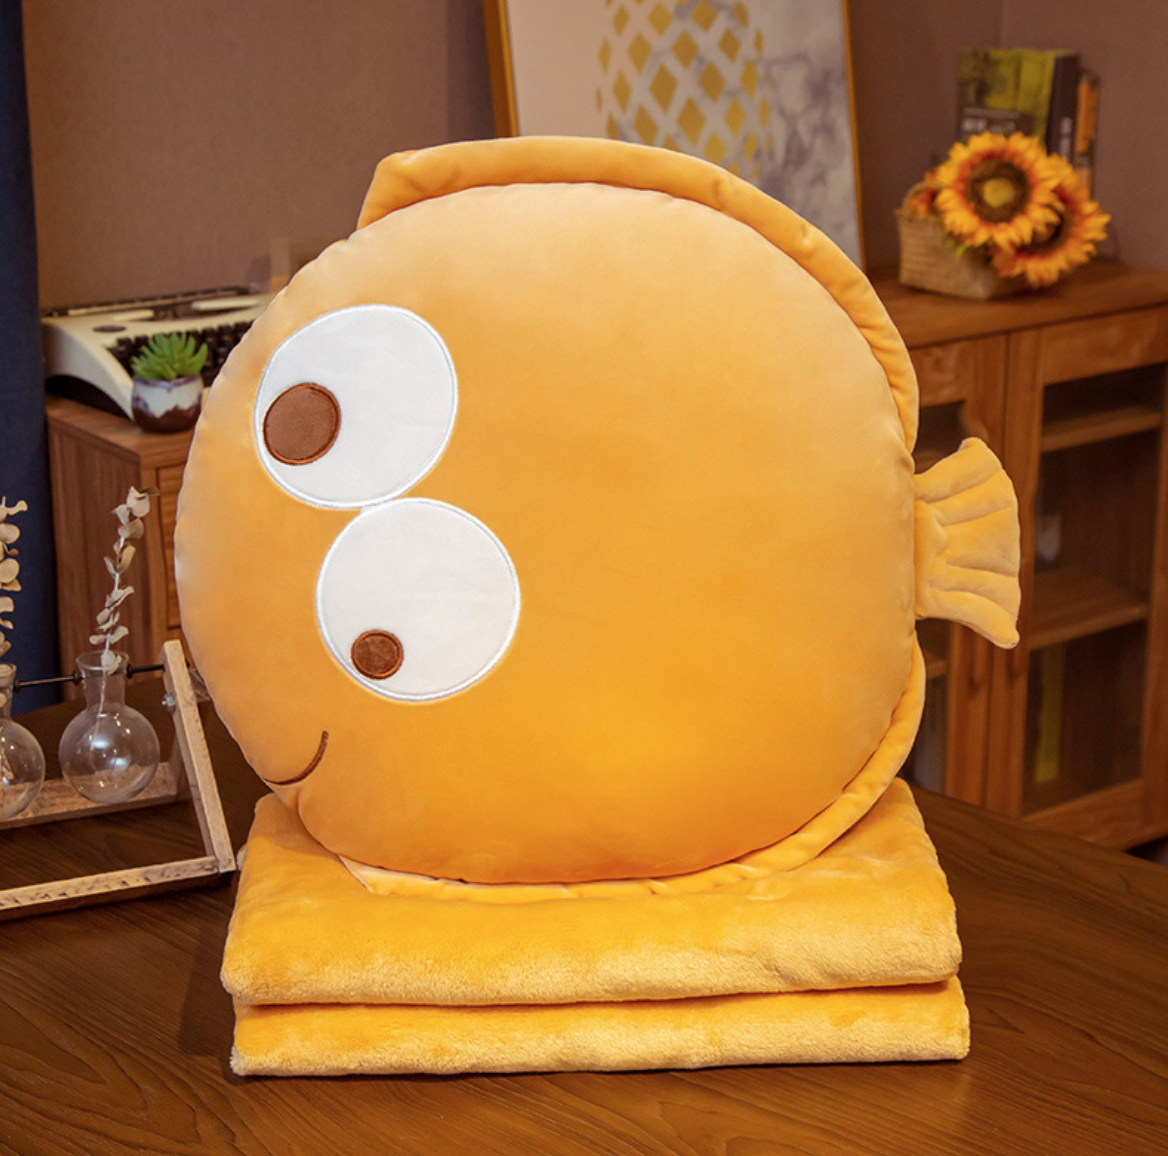 Orange Flounder Plush Blanket